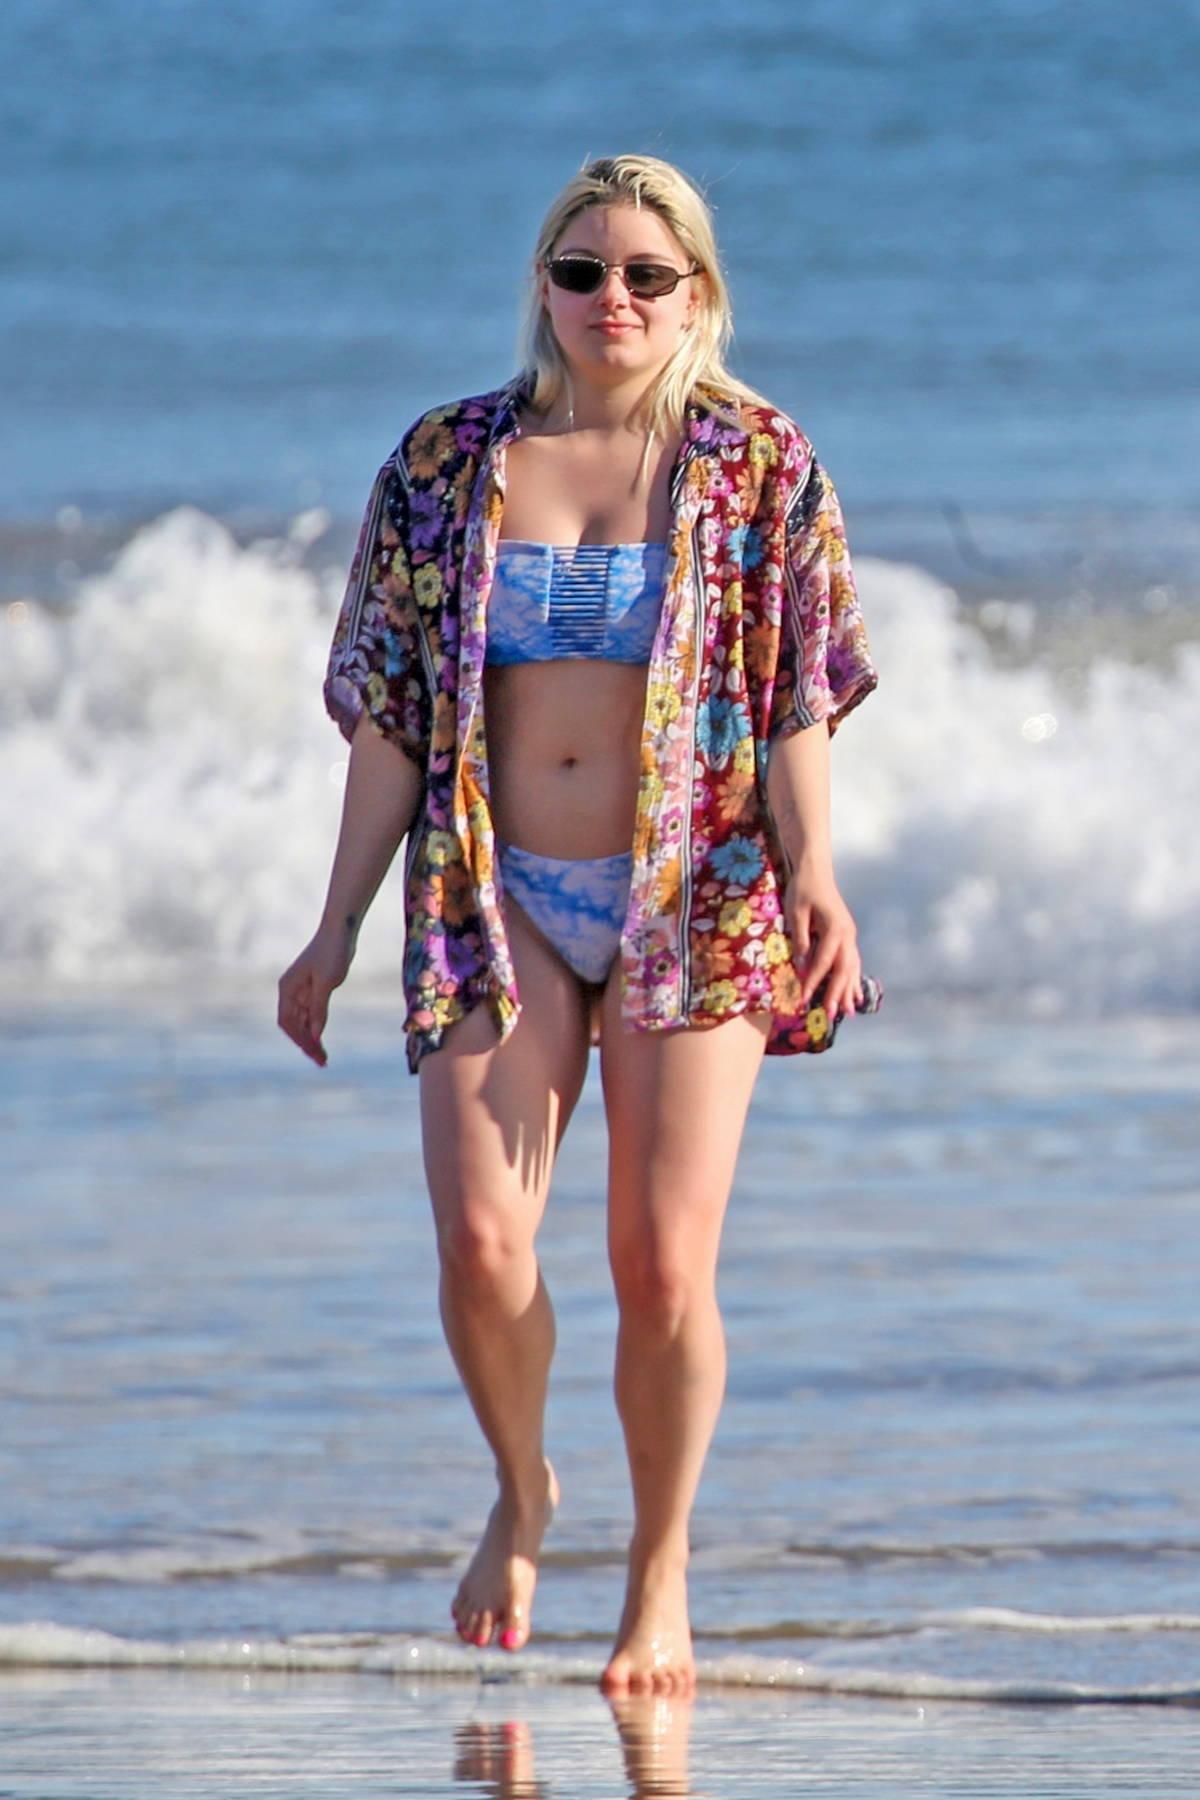 Ariel Winter stuns in a blue bikini while enjoying a beach day with boyfriend Luke Benward in Santa Barbara, California